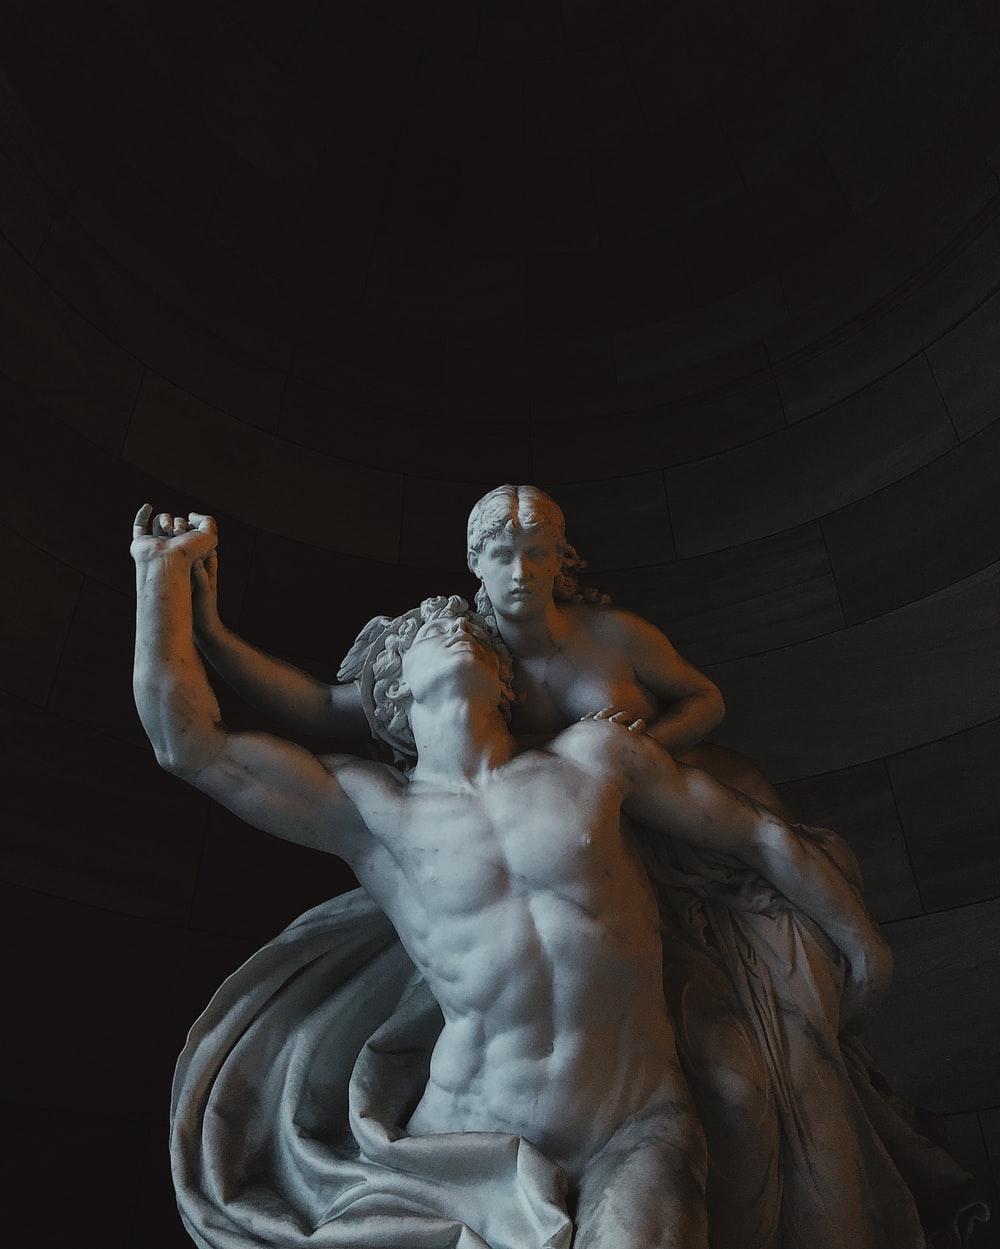 100 Sculpture Pictures Download Images on Unsplash 1000x1249